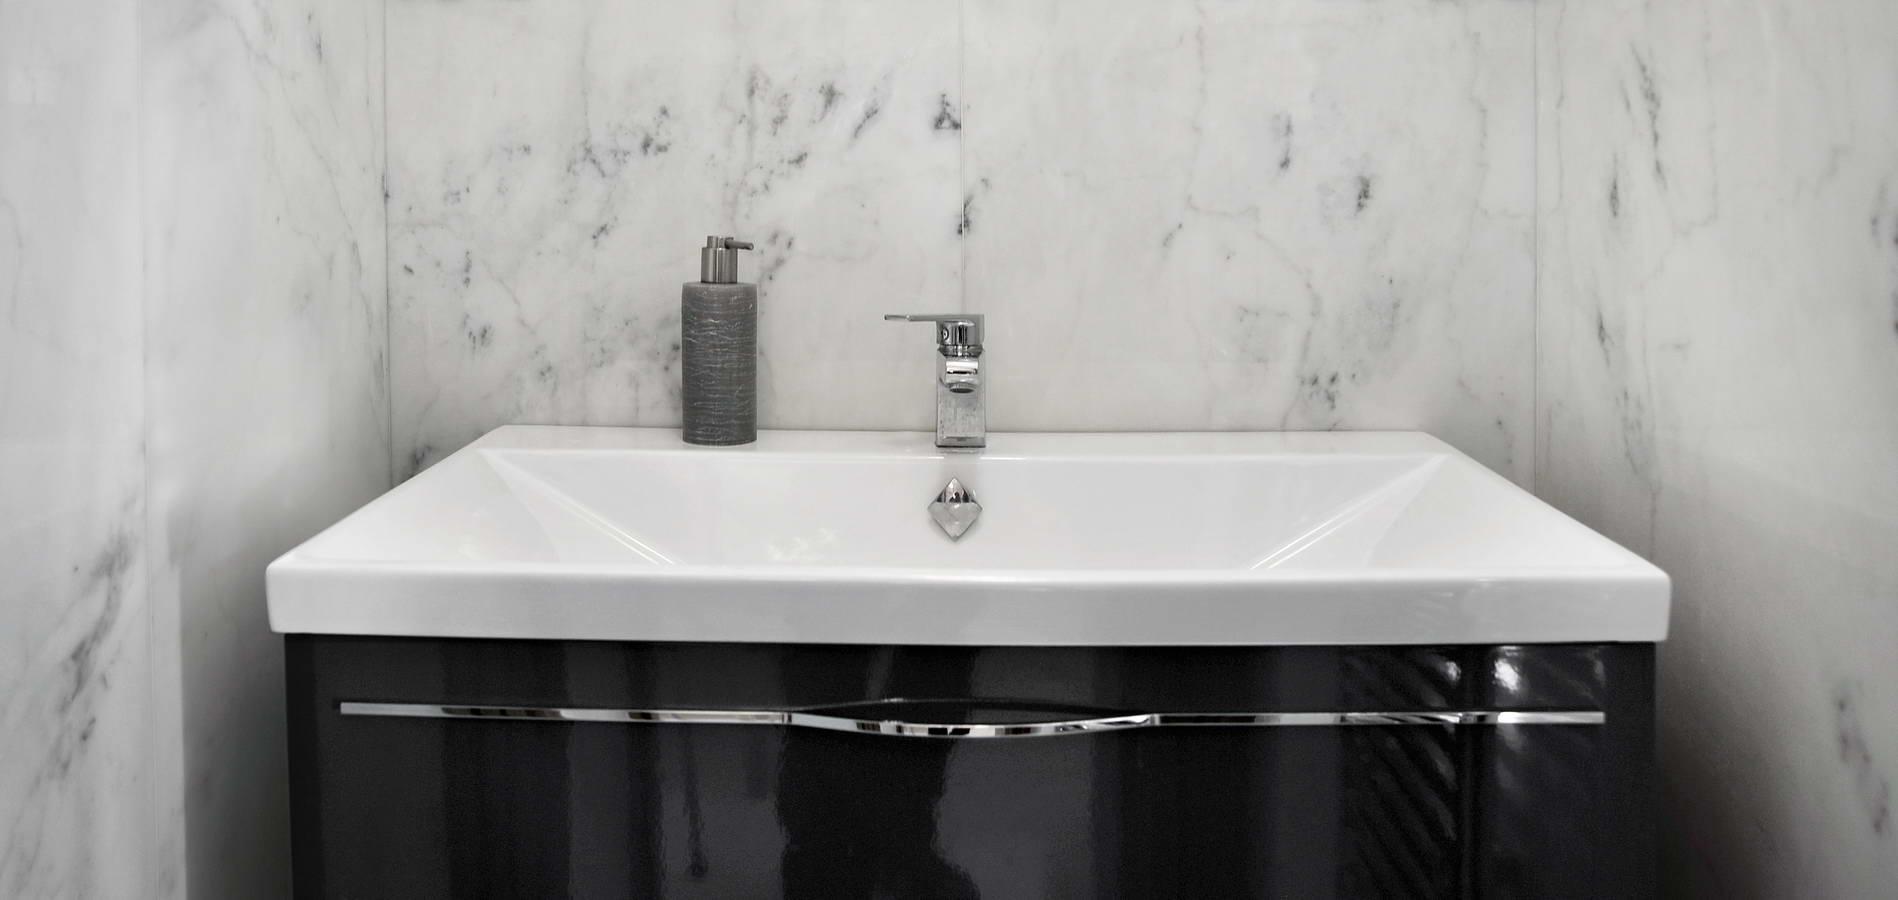 Bathroom Wall Cladding and Floor Paving, Calacatta